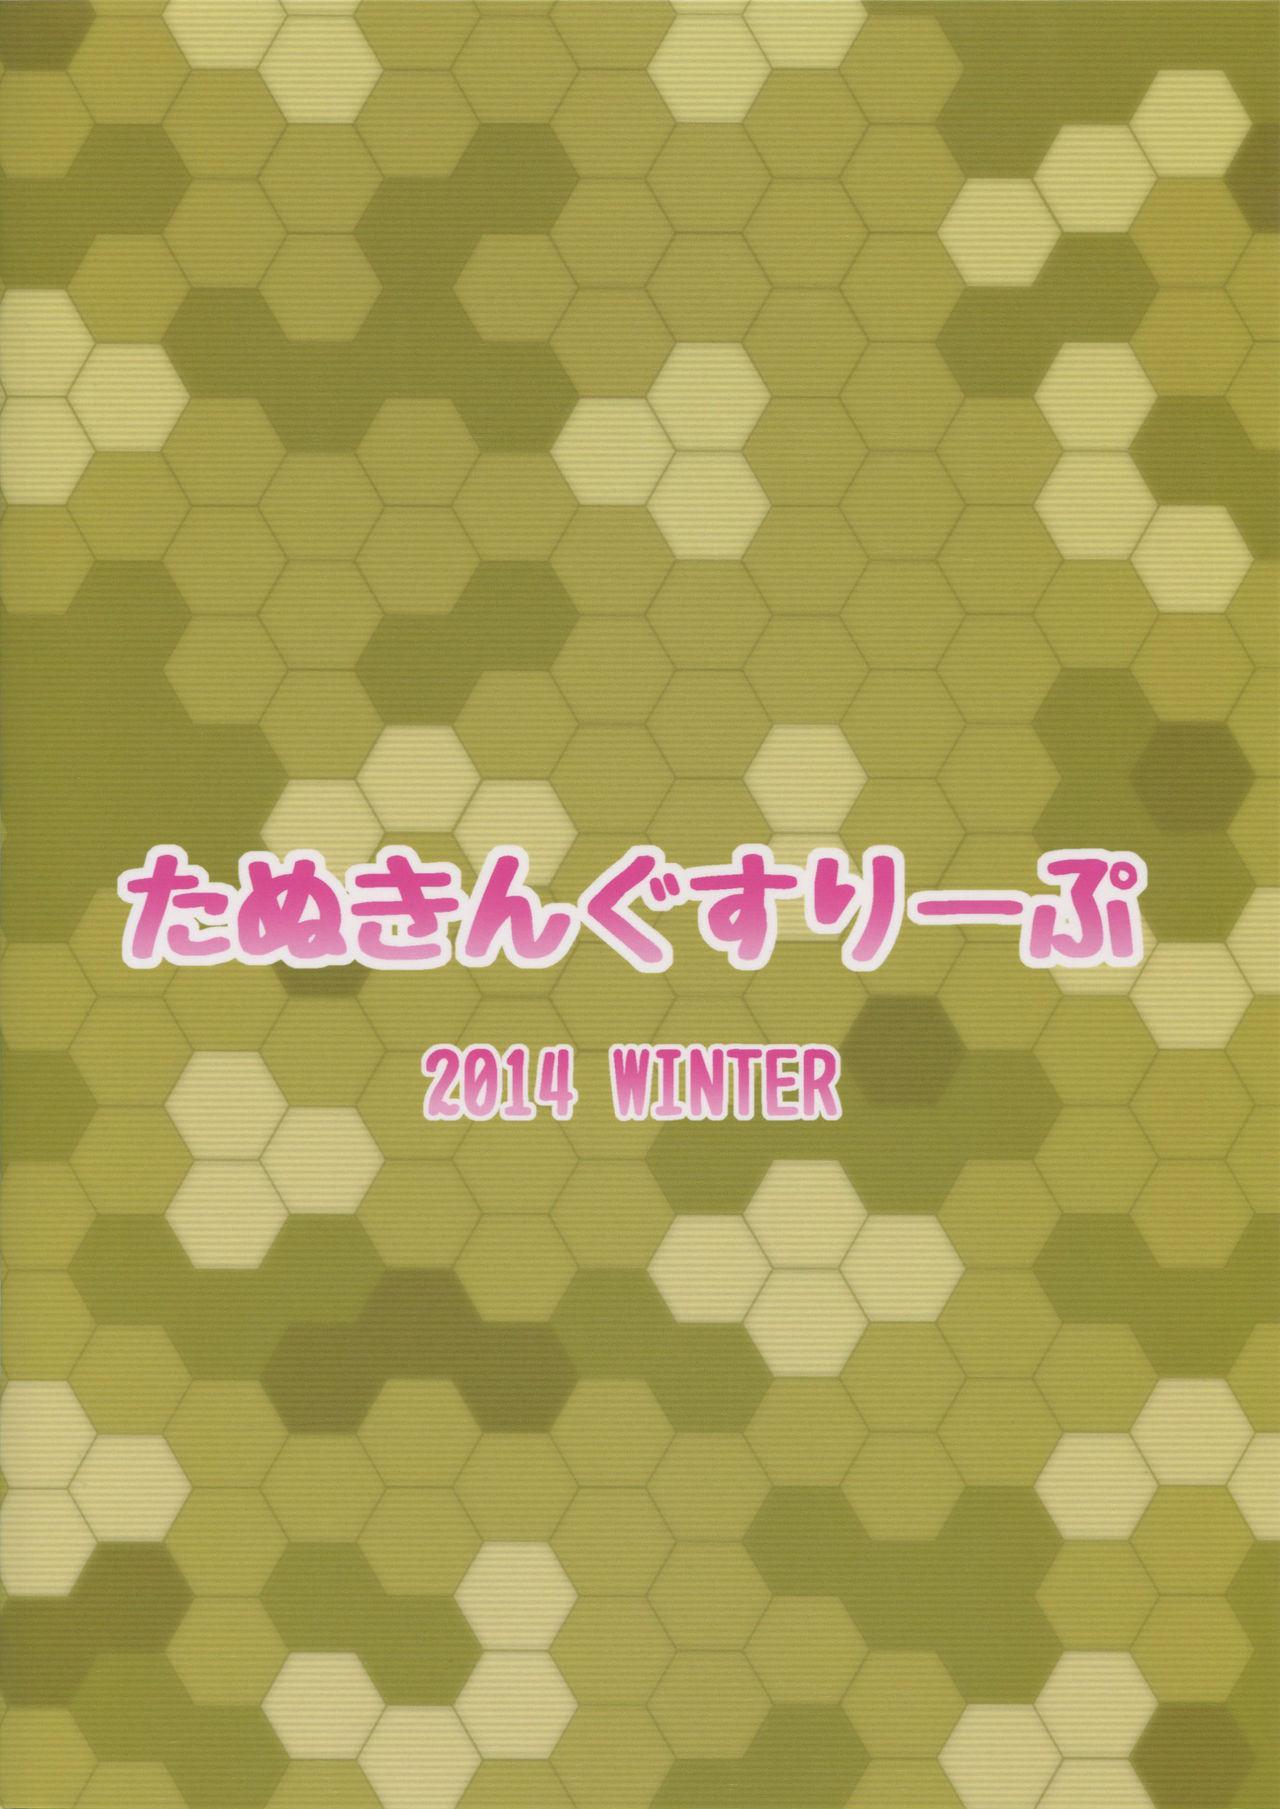 Souryuushiki Kaishun Massage 21